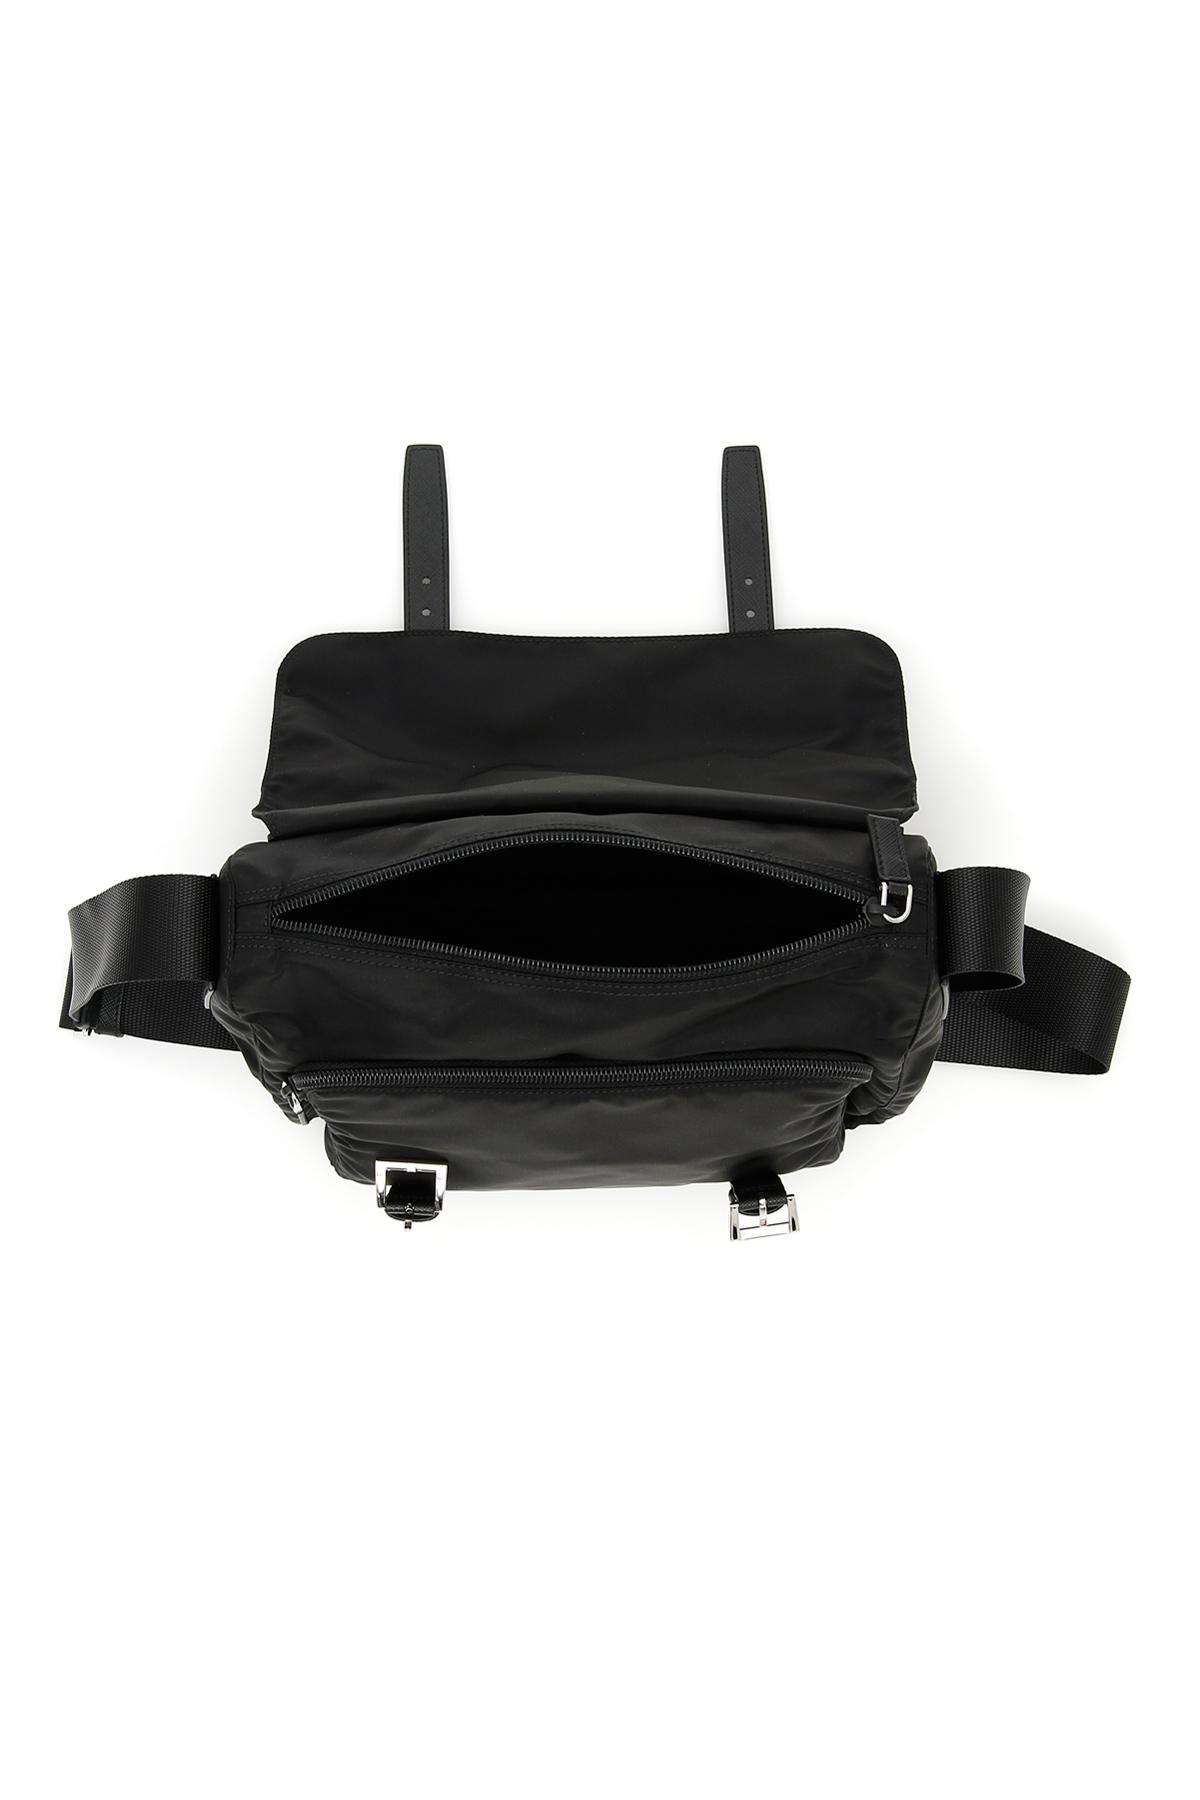 970b3b920e40 ... australia prada black nylon messenger bag lyst. view fullscreen 3e732  66aac